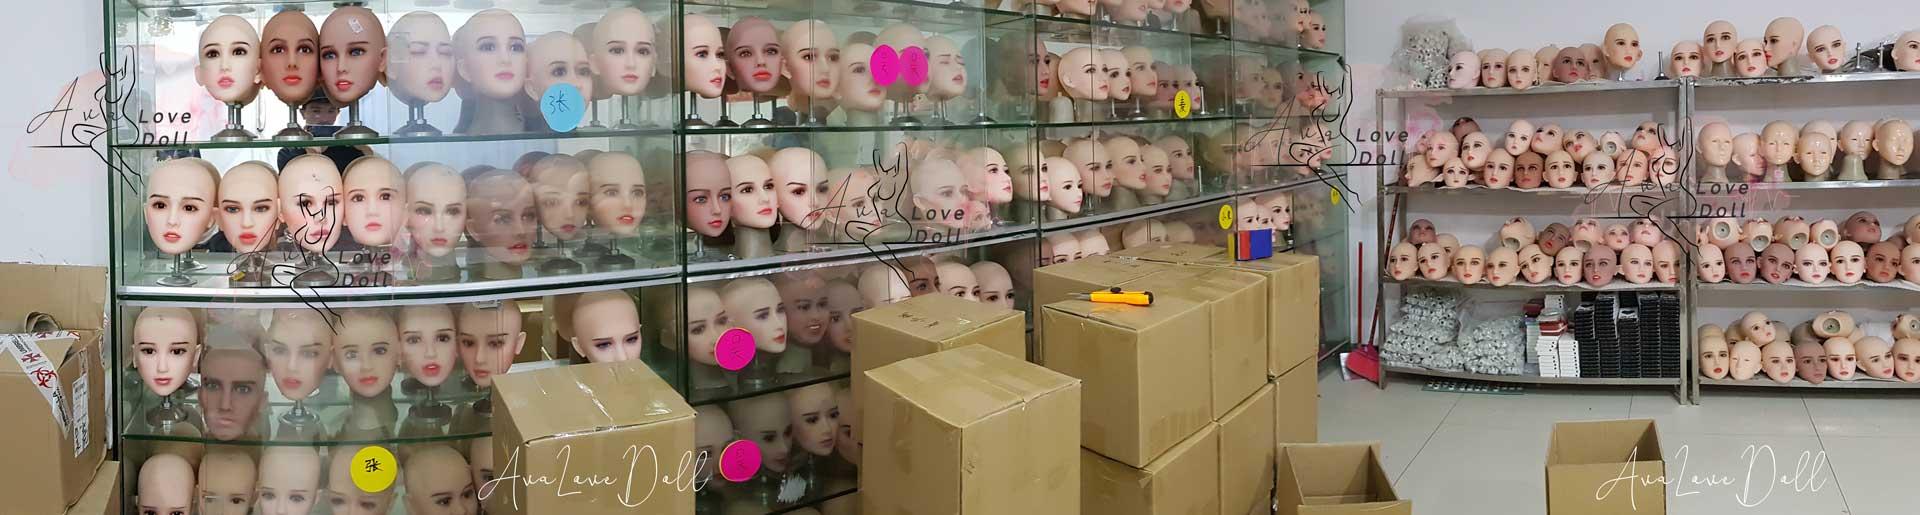 Inside JY Doll factory TPE sexdoll